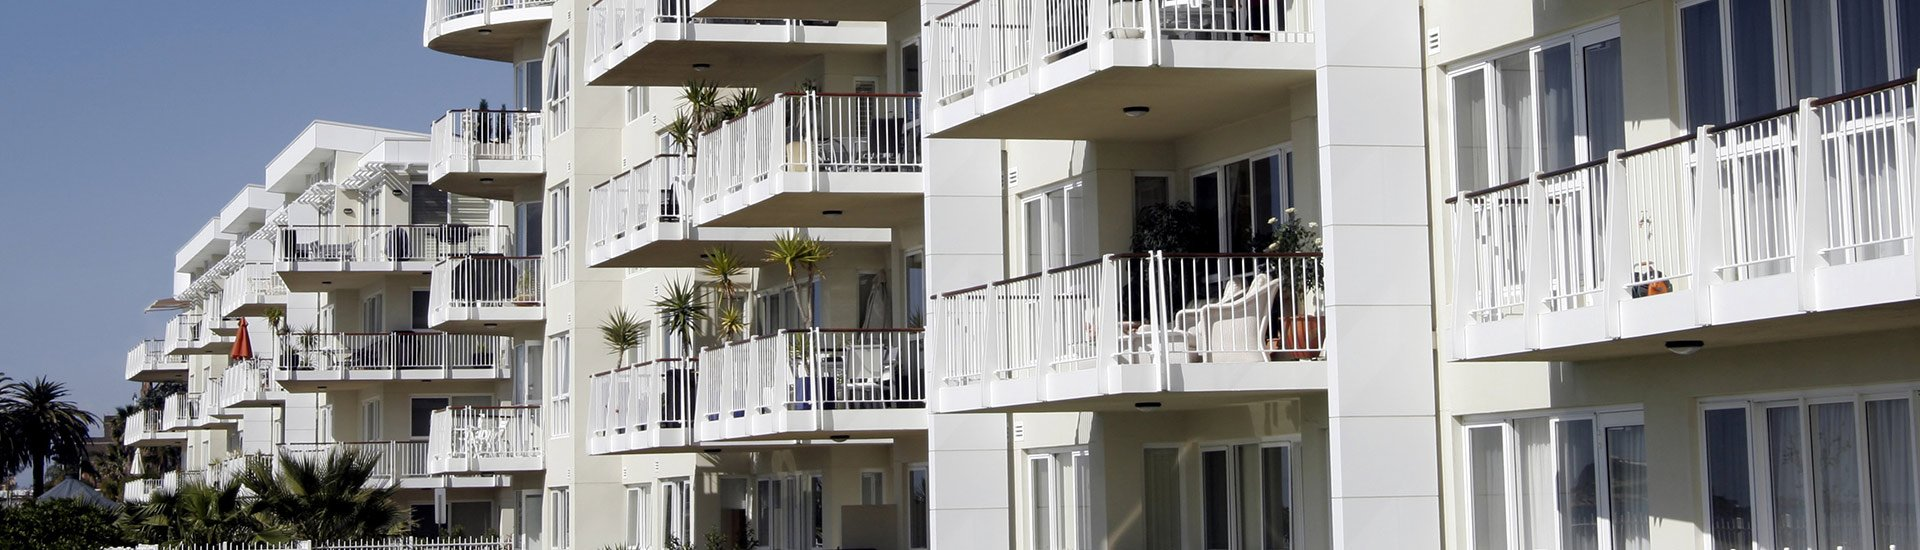 bernies trades australian residential high rise building